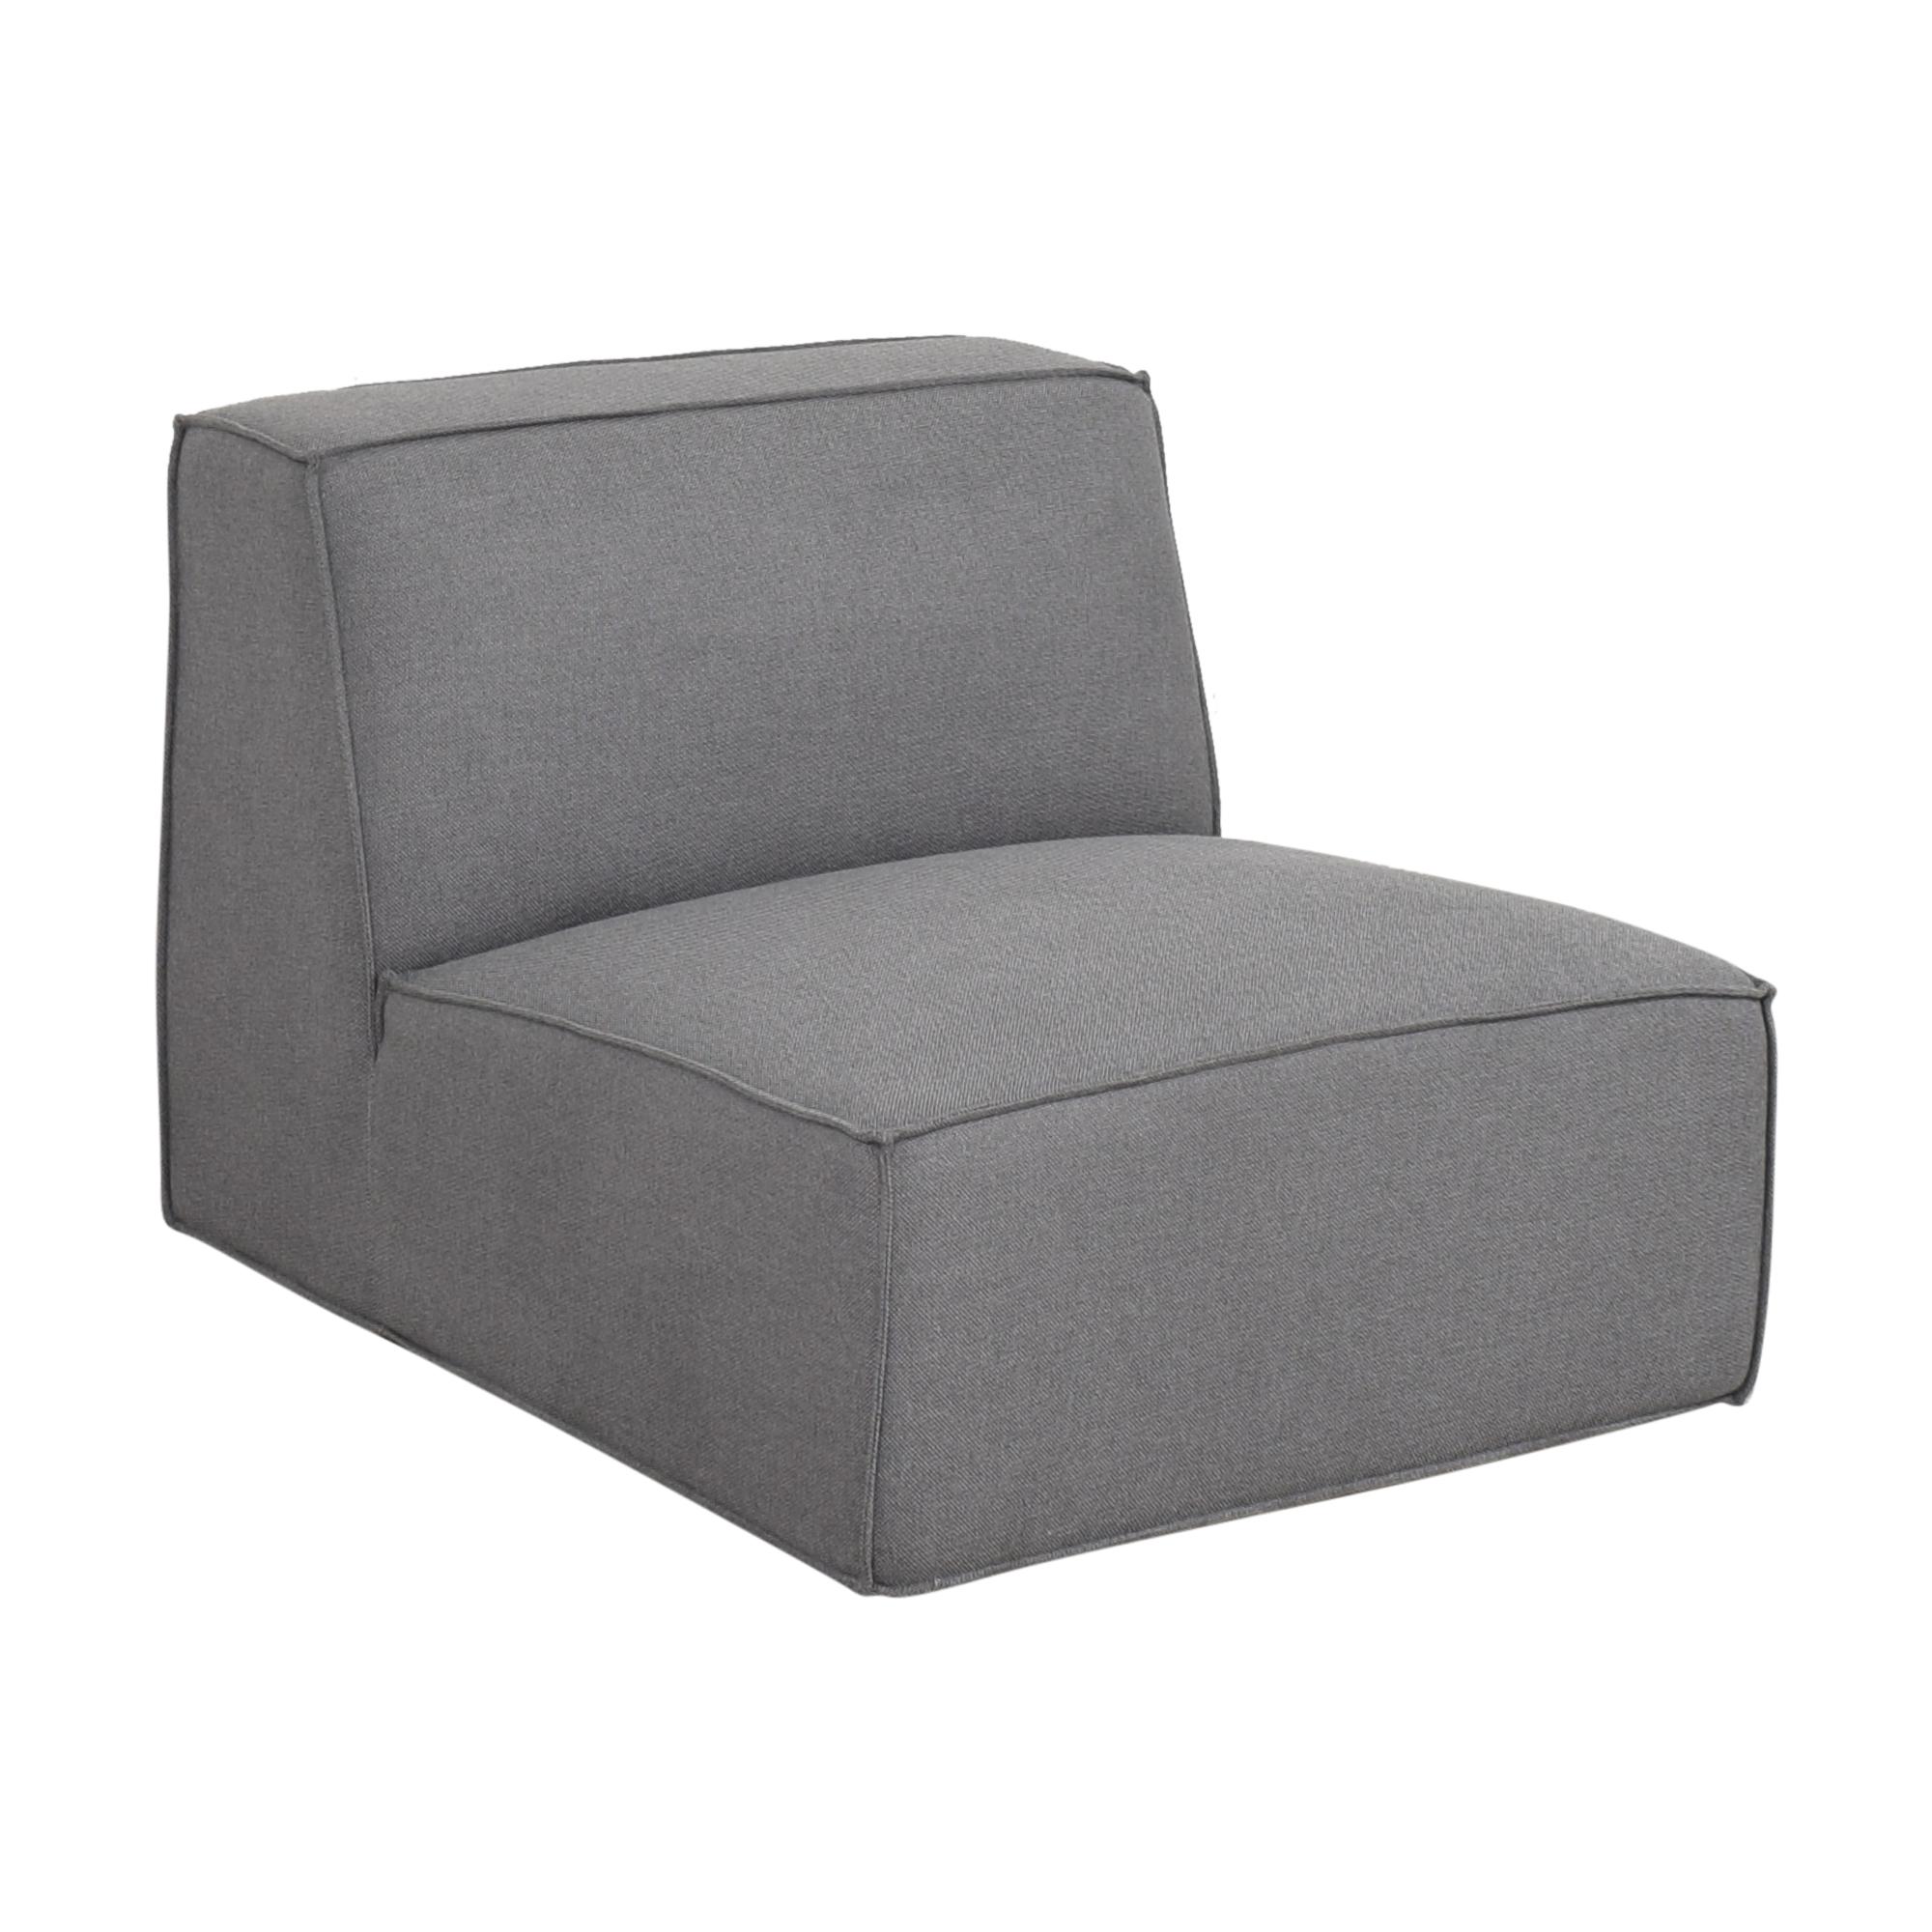 Rove Concepts Rove Concepts Porter Armless Grande Chair discount